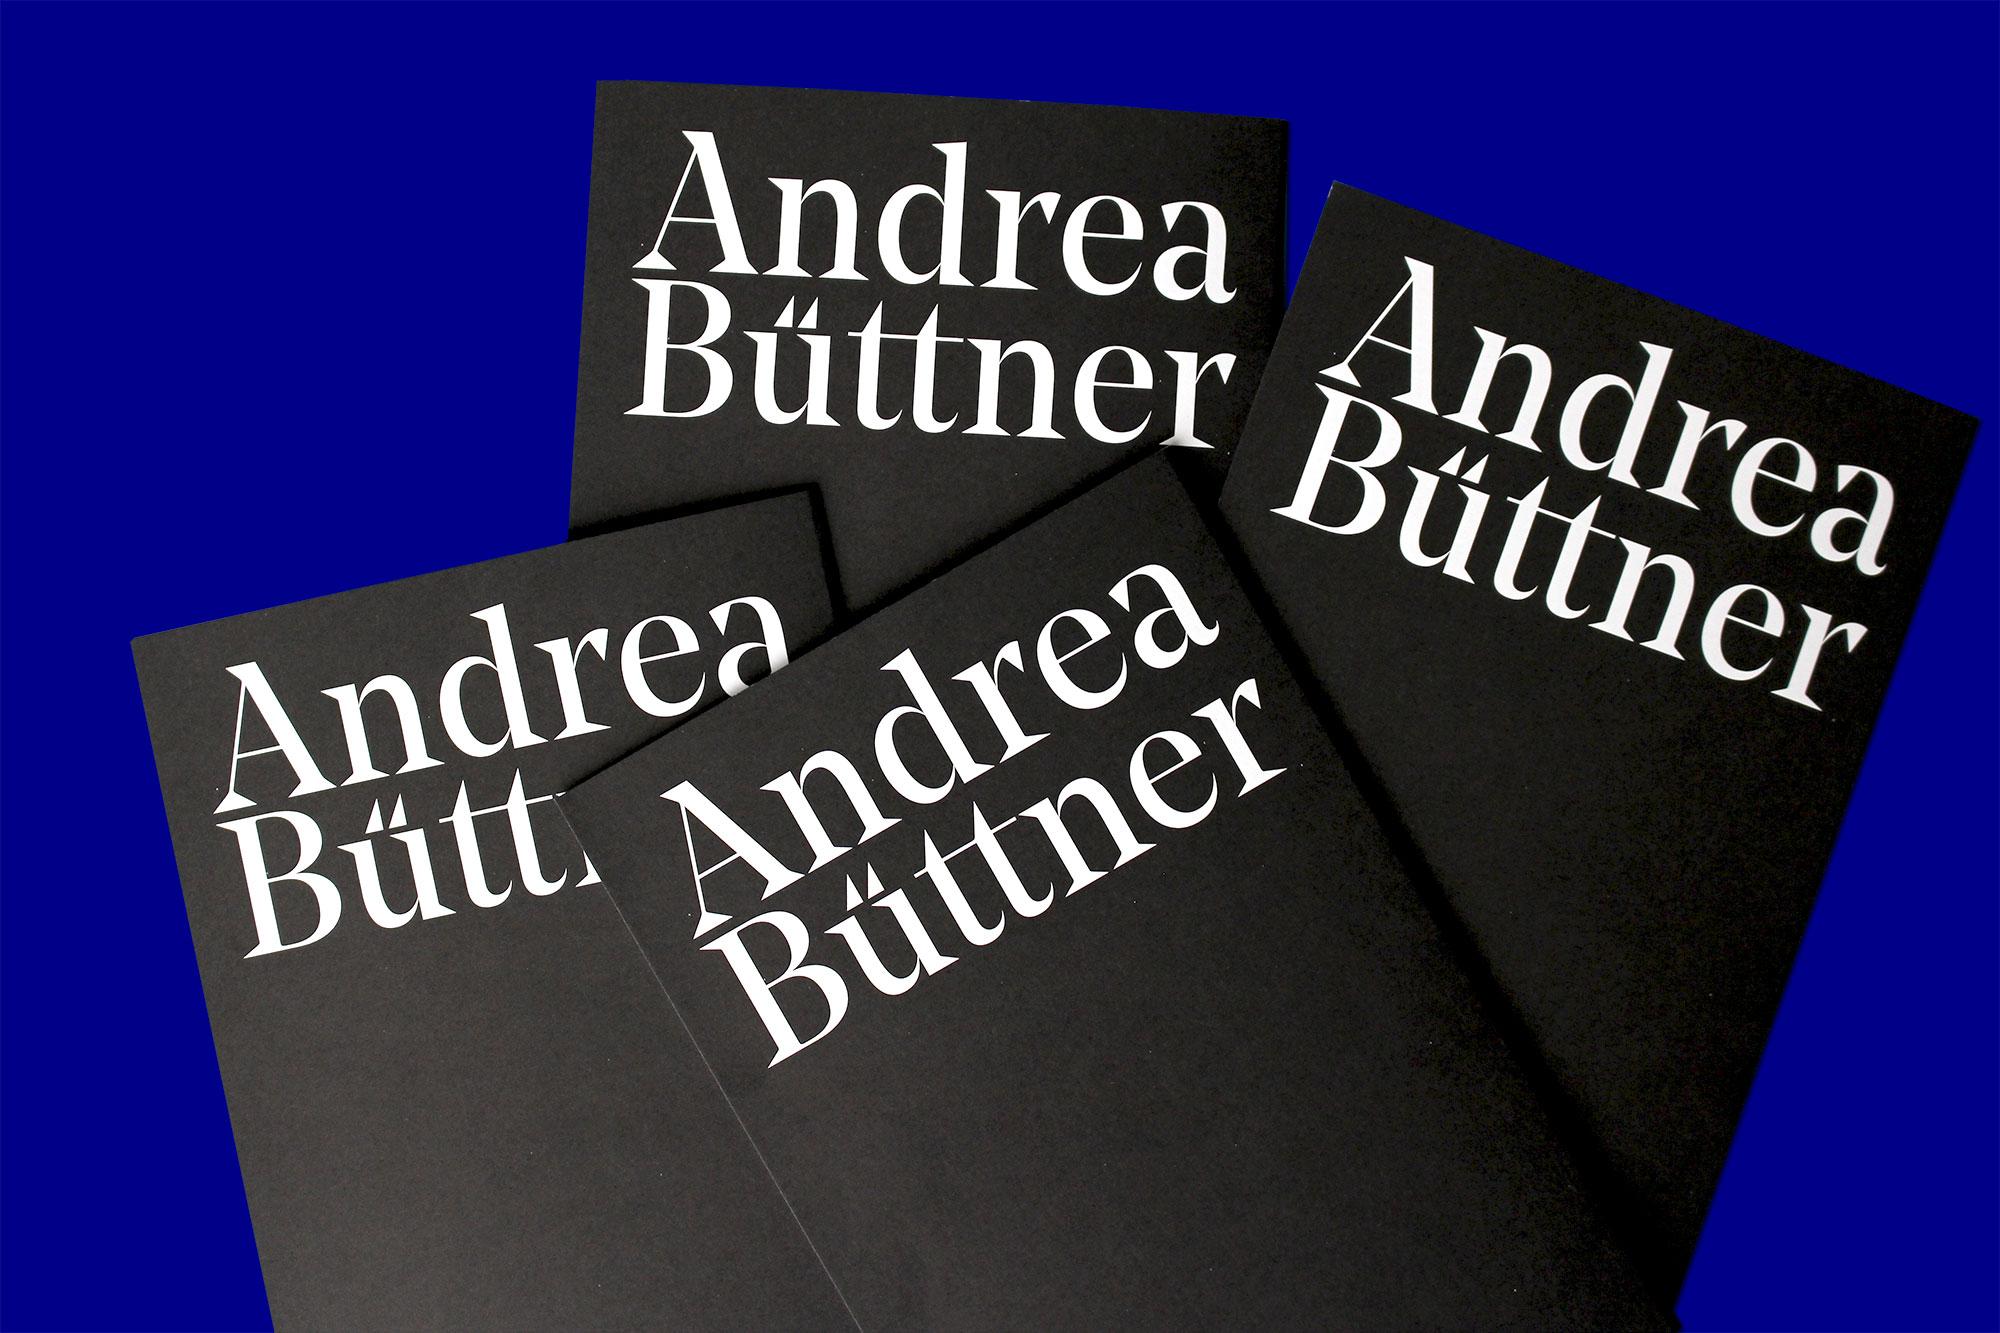 BAKA GABRIELA ANDREA BUTTNER IDENTITY